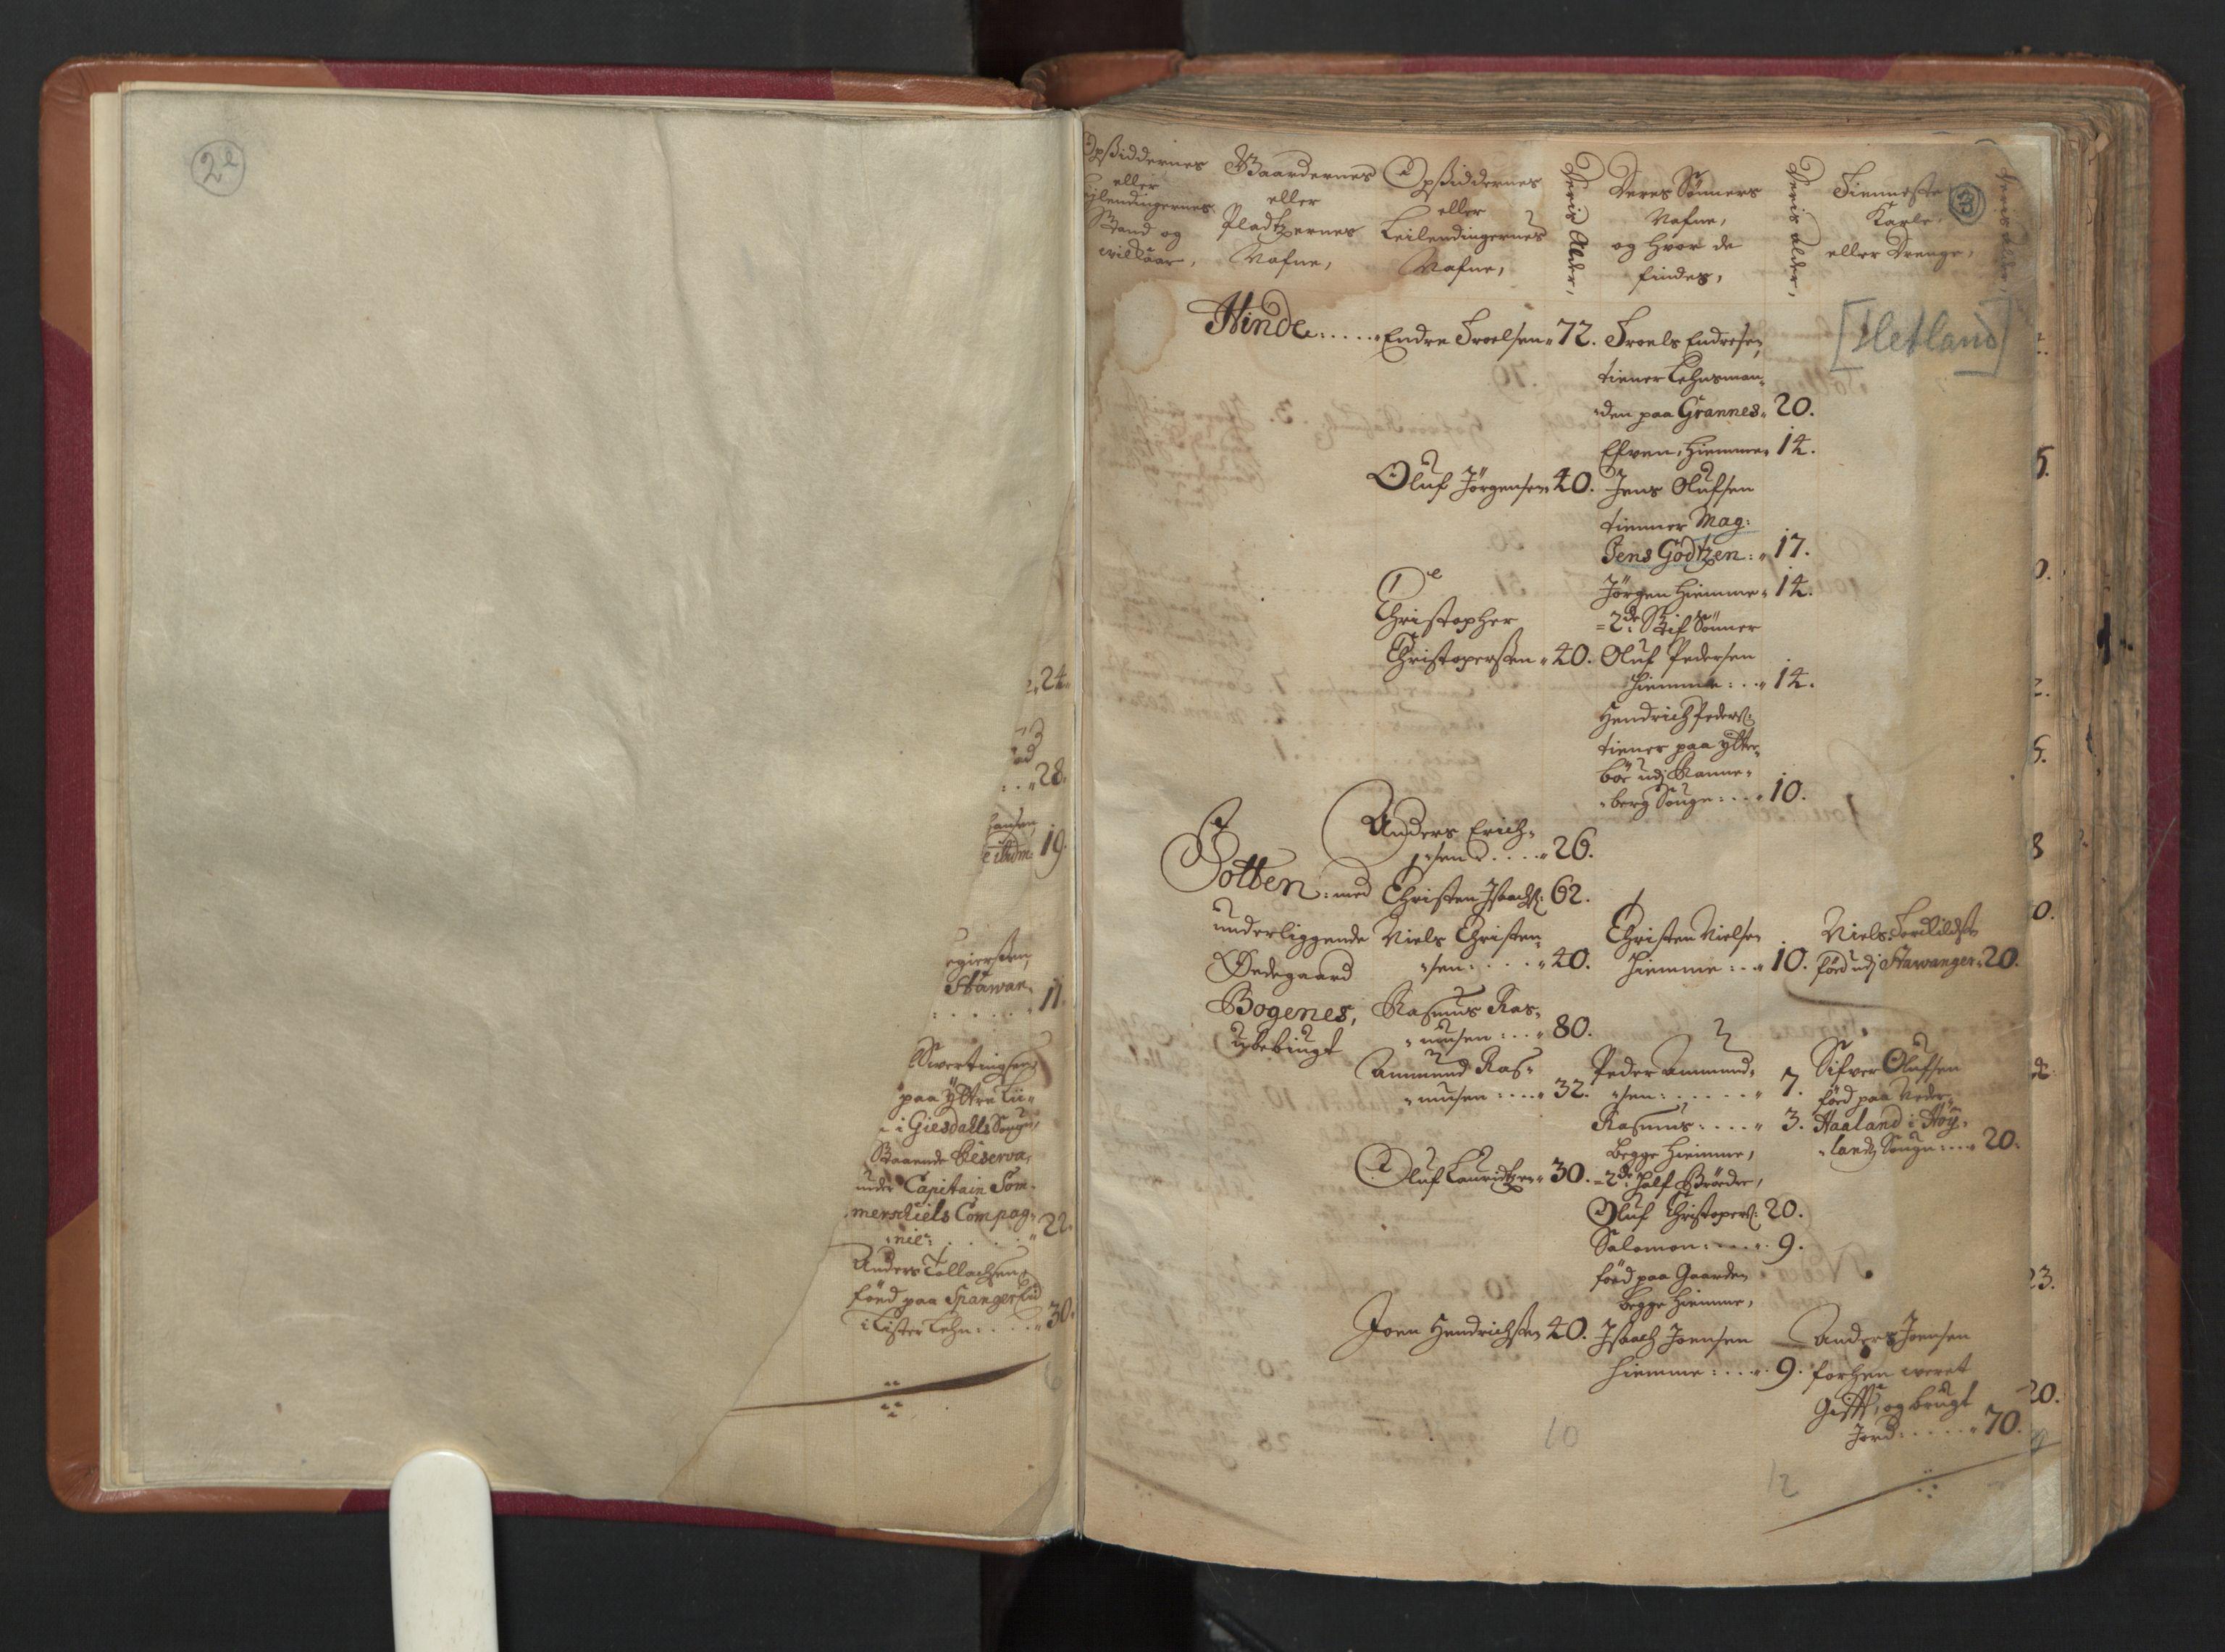 RA, Manntallet 1701, nr. 4: Jæren og Dalane fogderi, 1701, s. 3